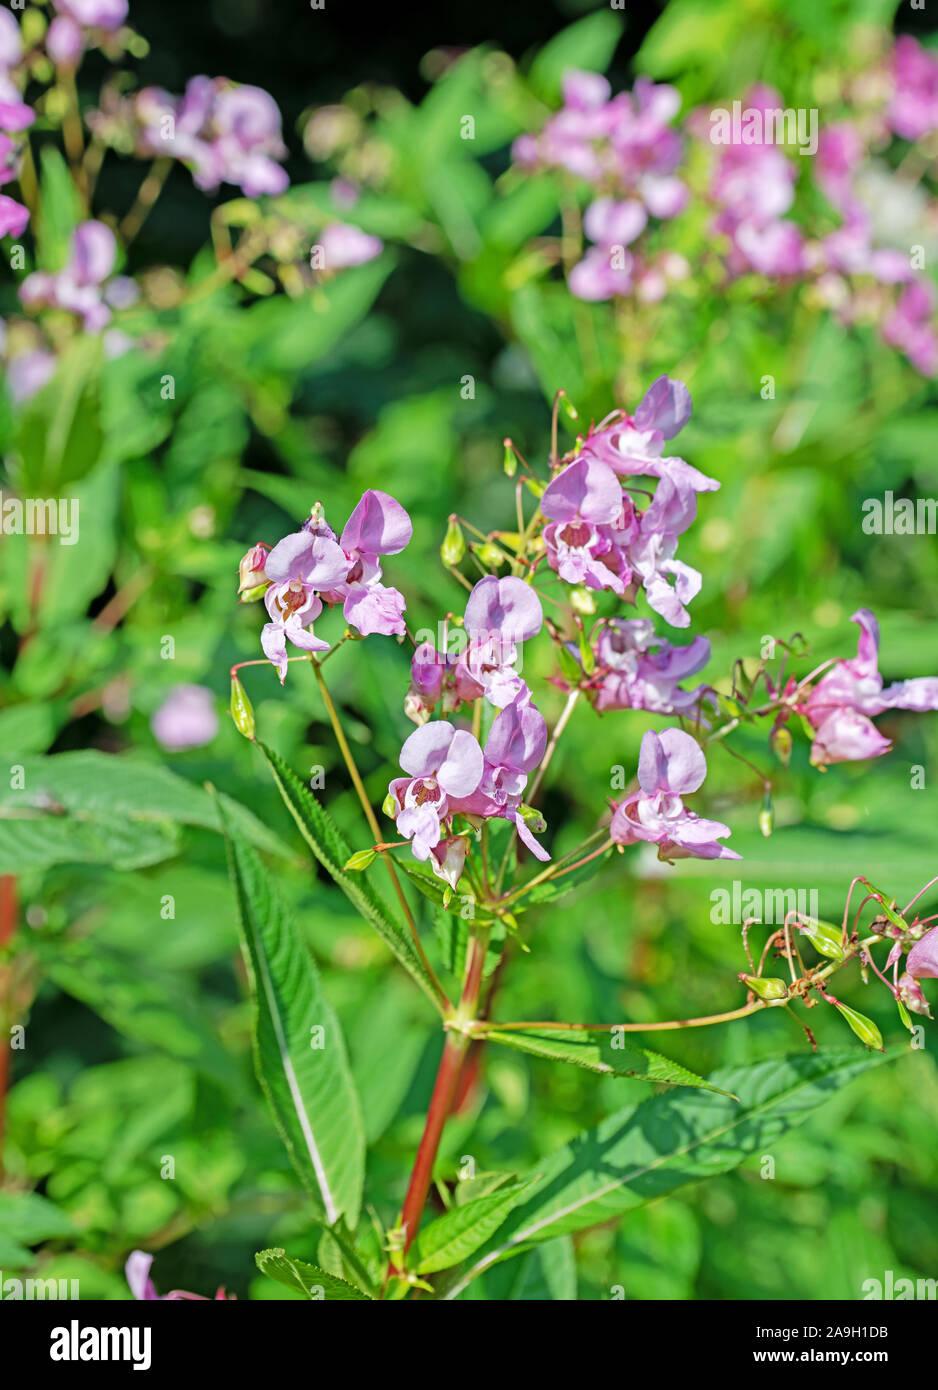 Blossoming balsam,impatiens glandulifera Stock Photo